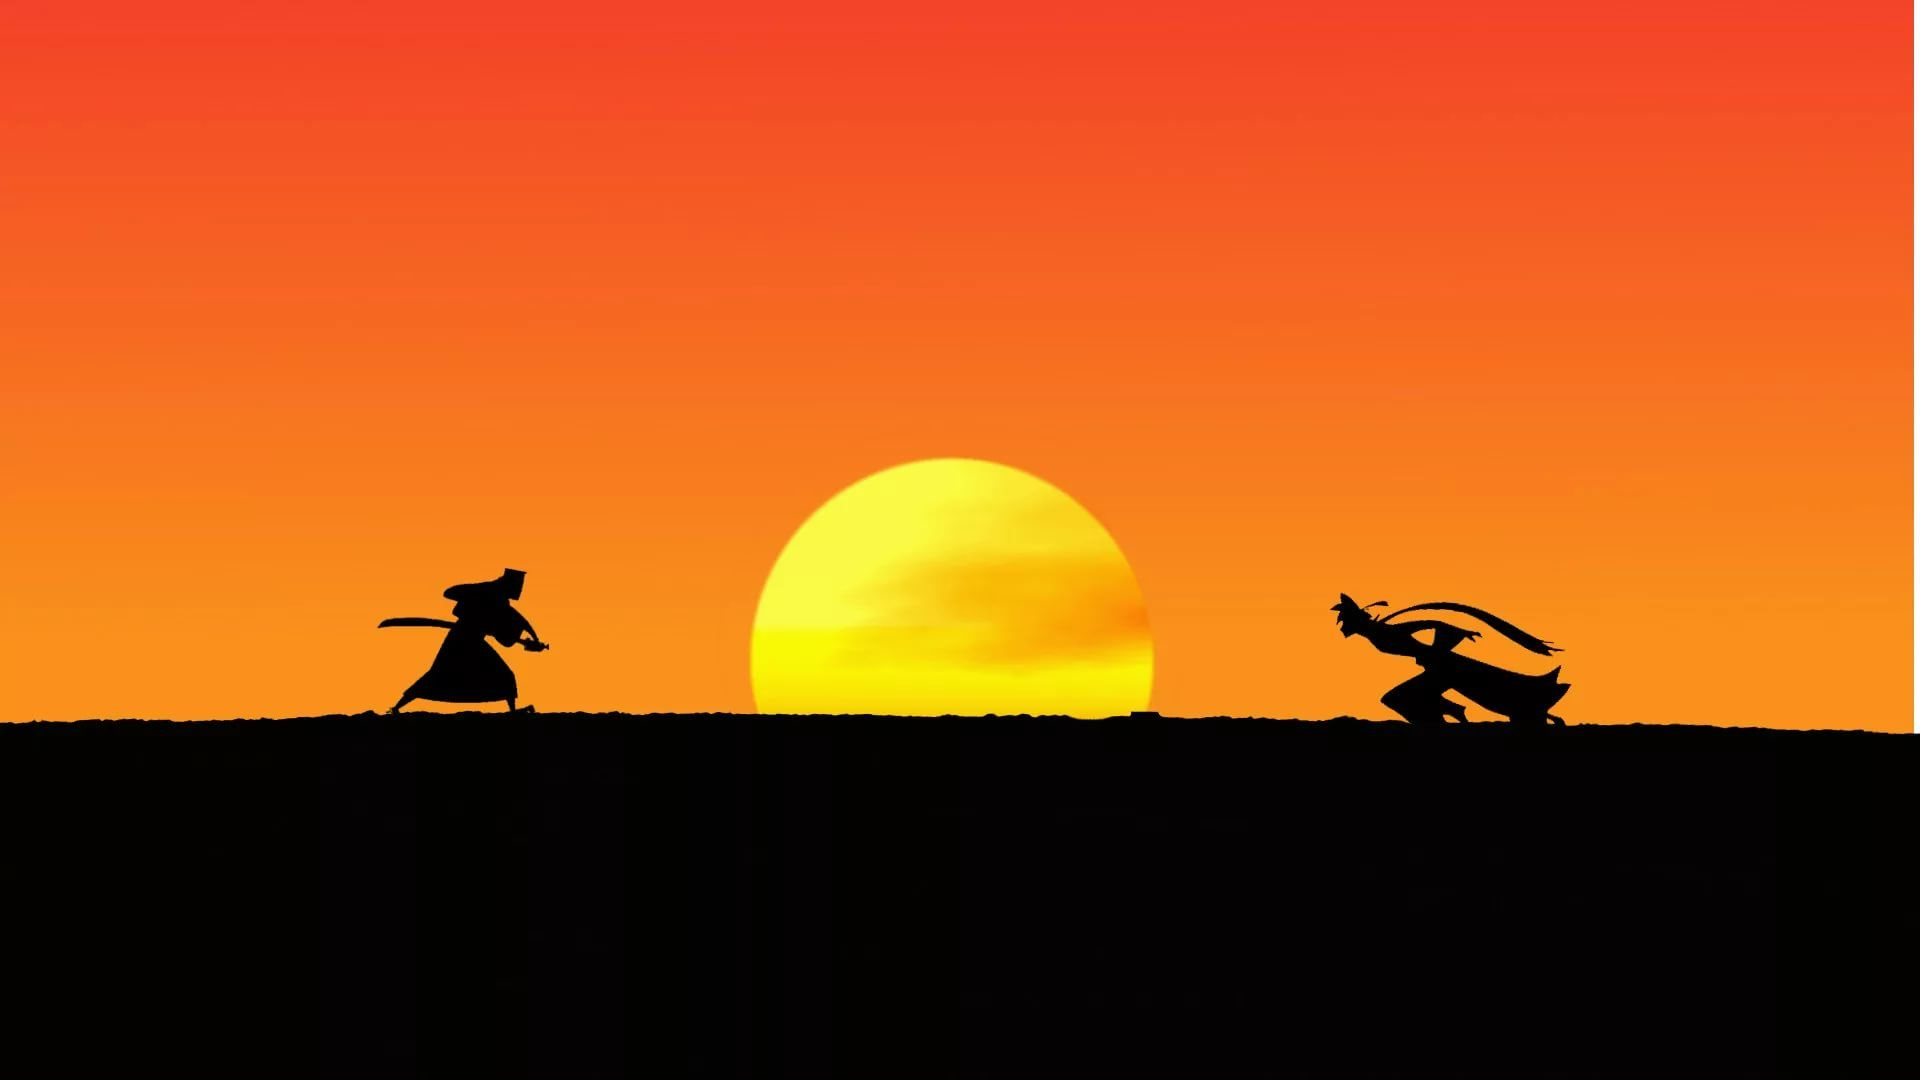 Samurai Jack hd wallpaper 1080p for pc